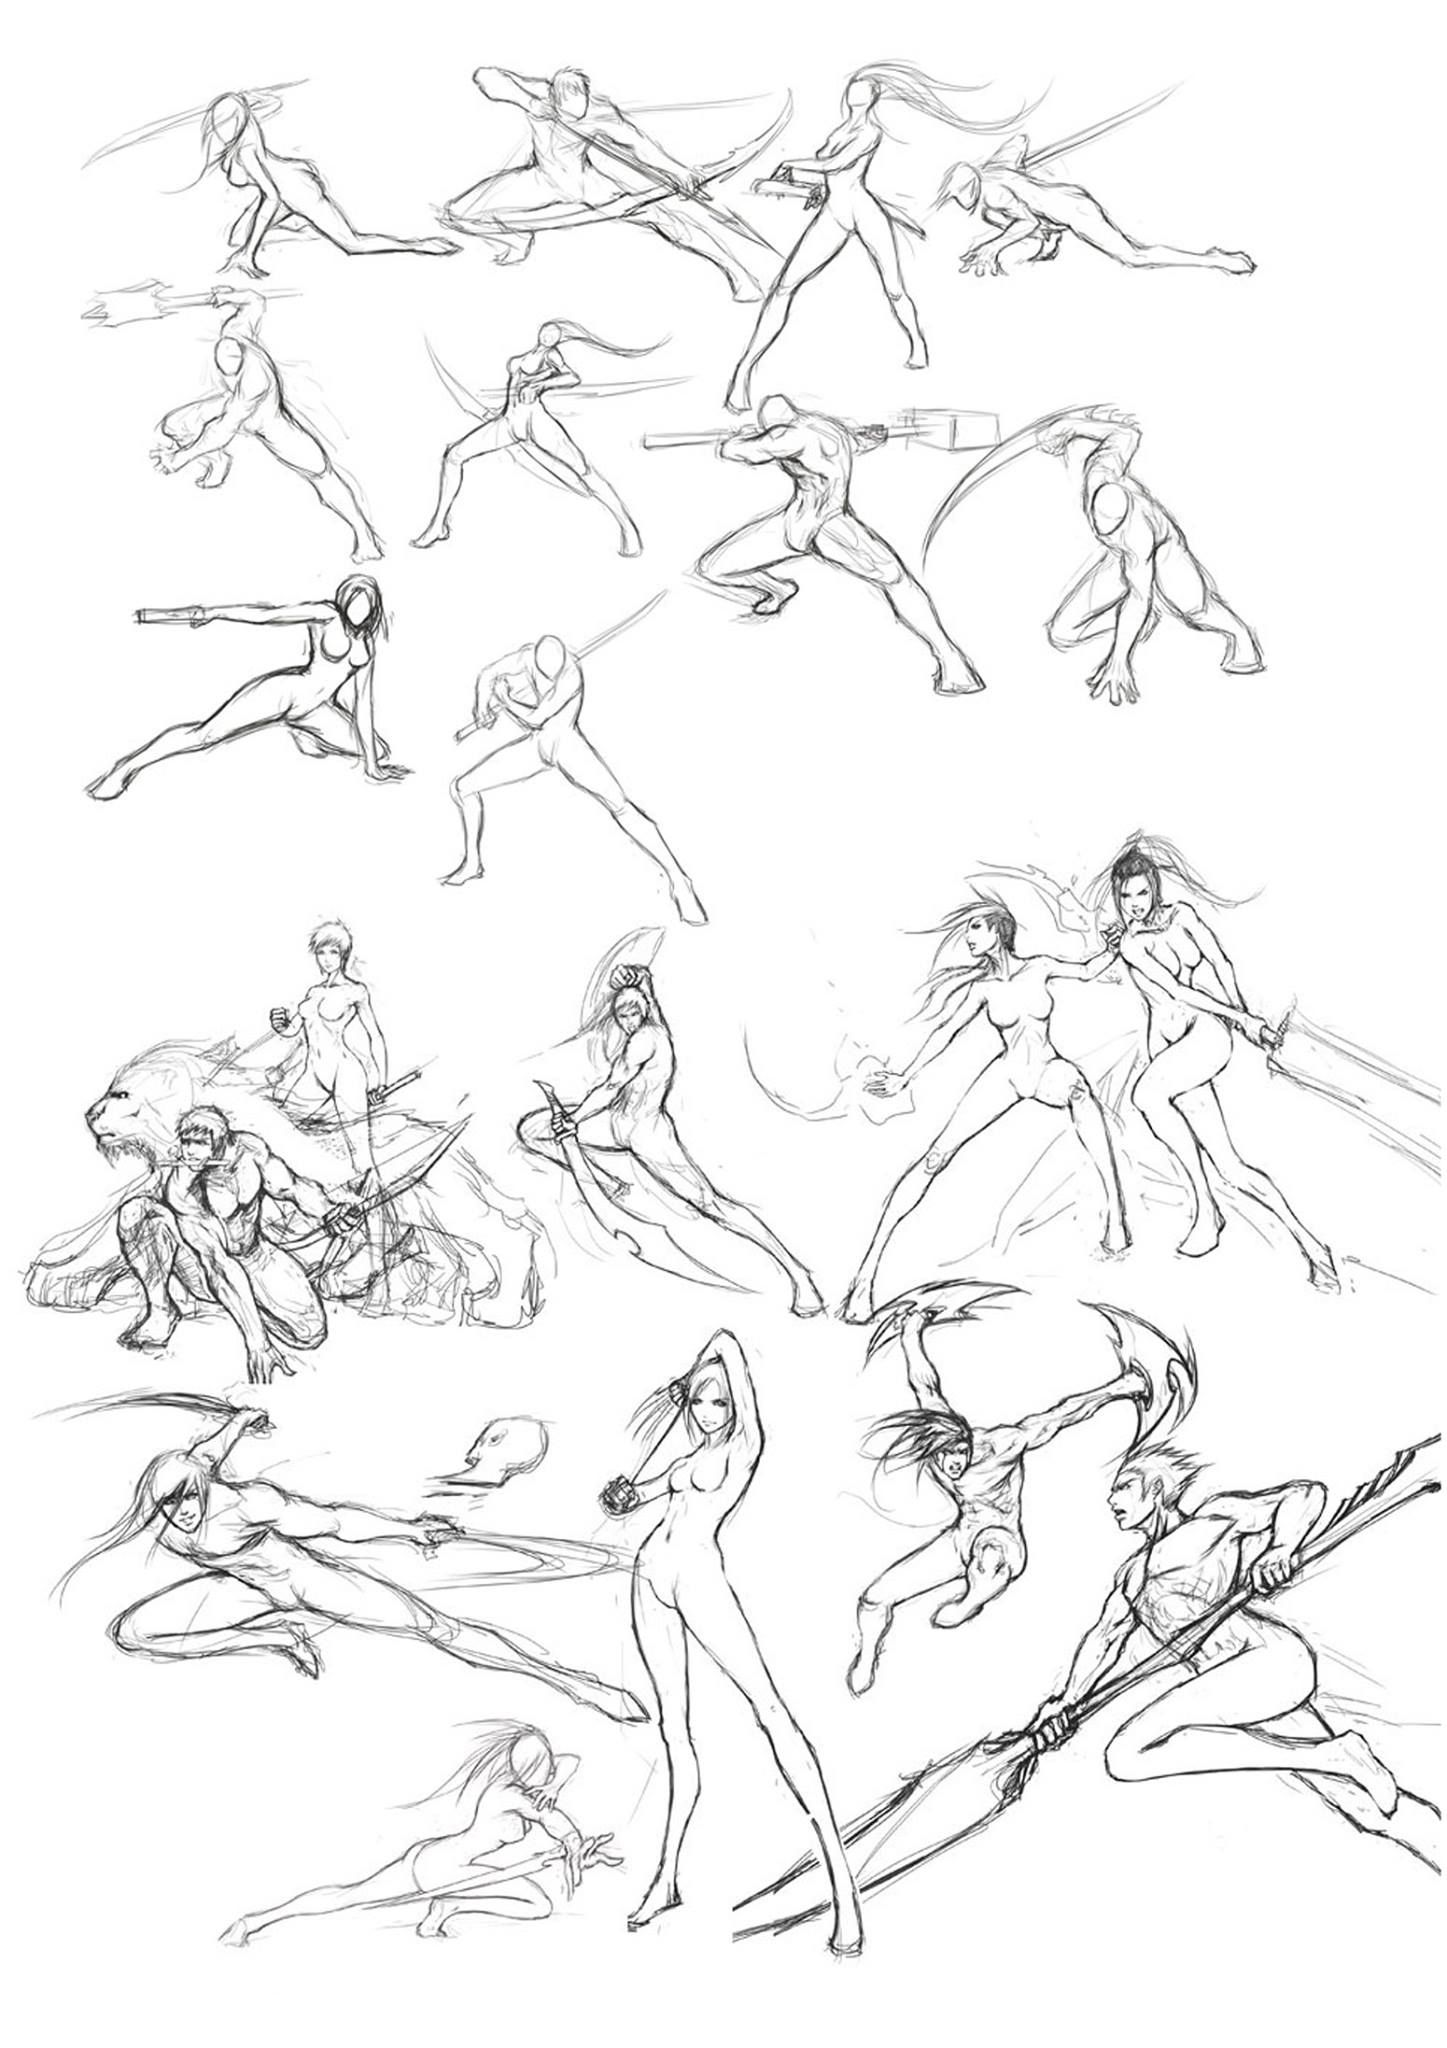 Pin de Lag arta en anime   Pinterest   Hombre dibujo, Anatomía y Dibujo